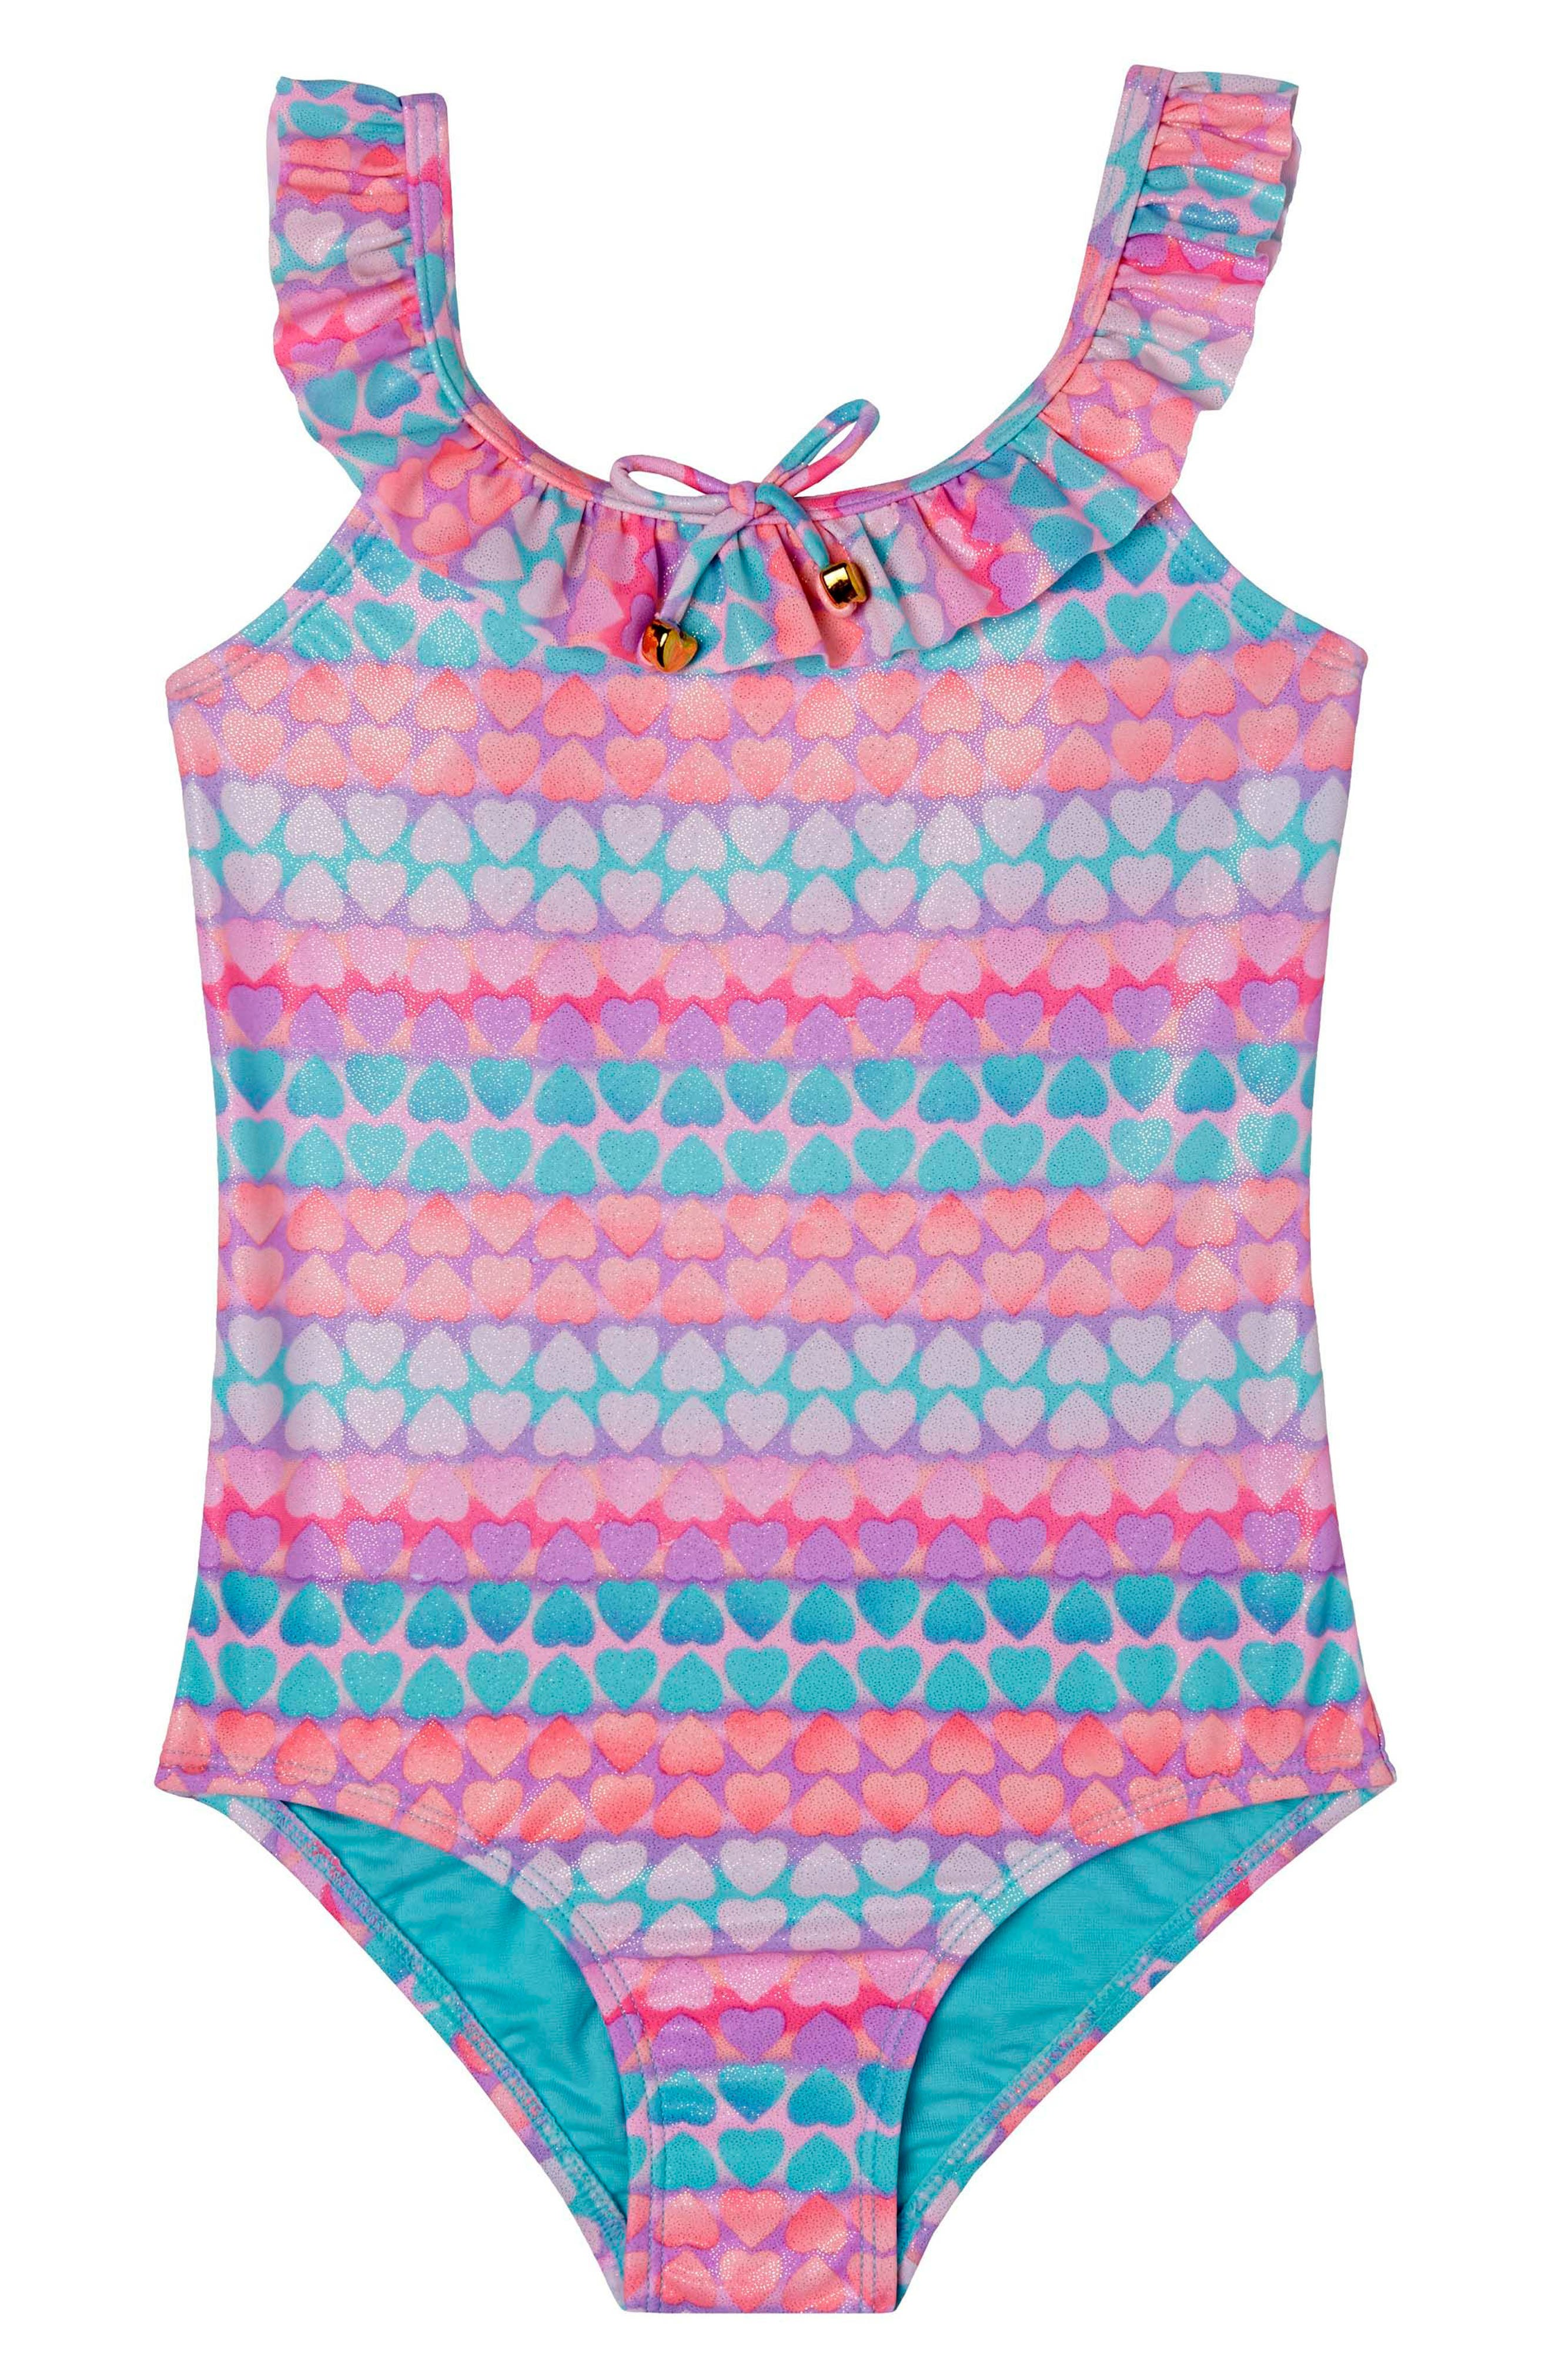 Main Image - Hula Star Hearts Galore One-Piece Swimsuit (Toddler Girls & Little Girls)